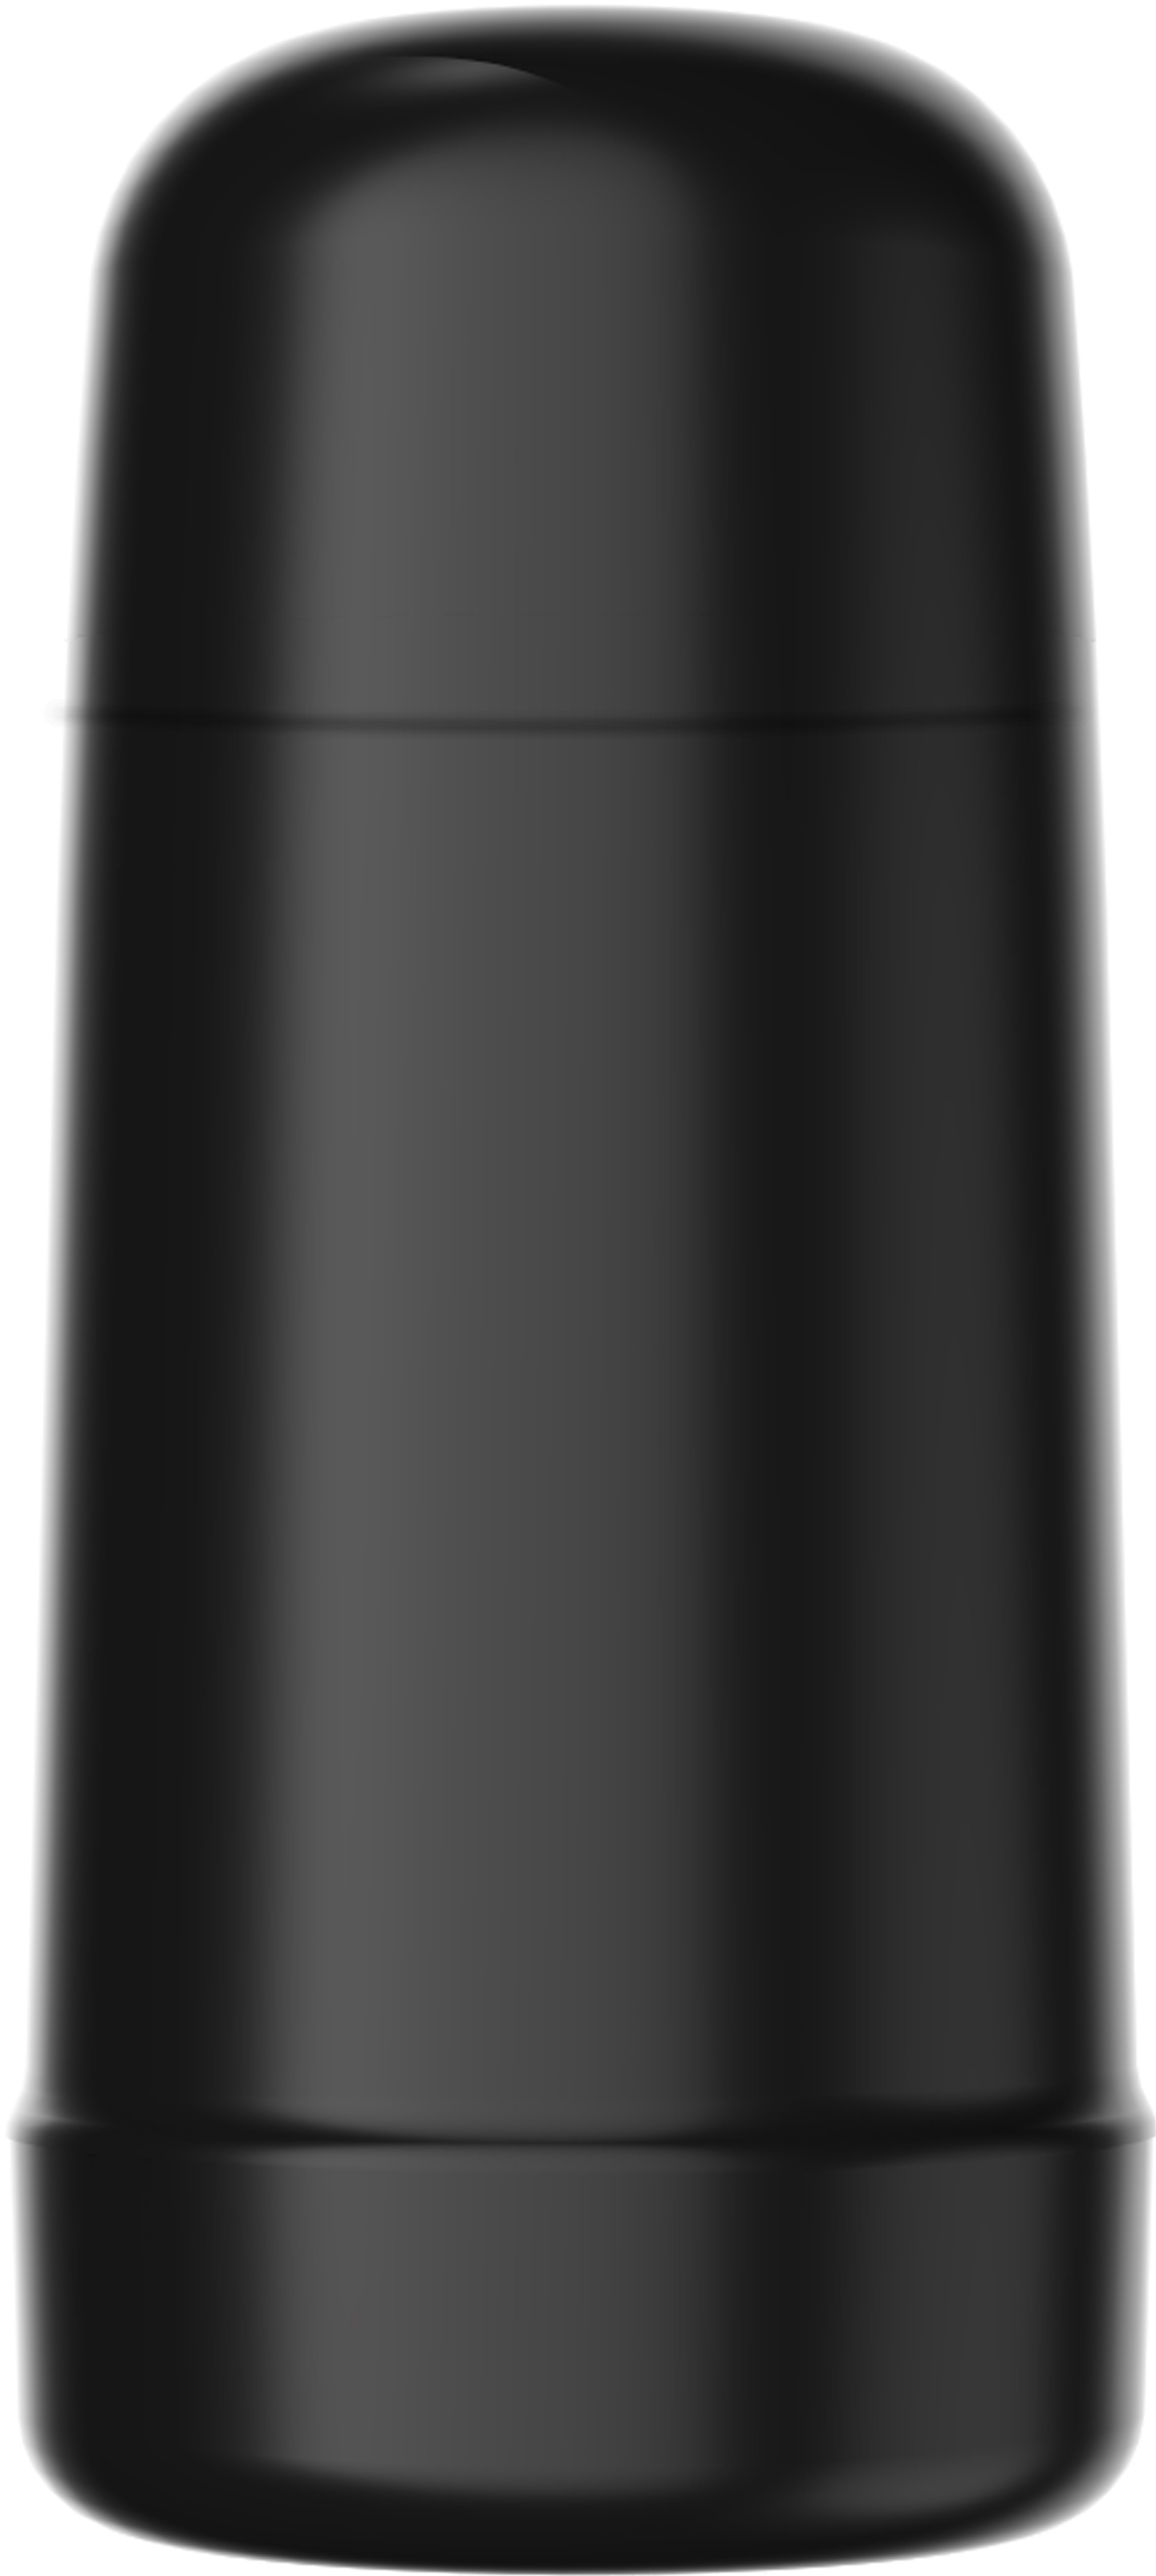 Garrafa Termica Minigarbo Preto 250ml Rolha Clean - Termolar